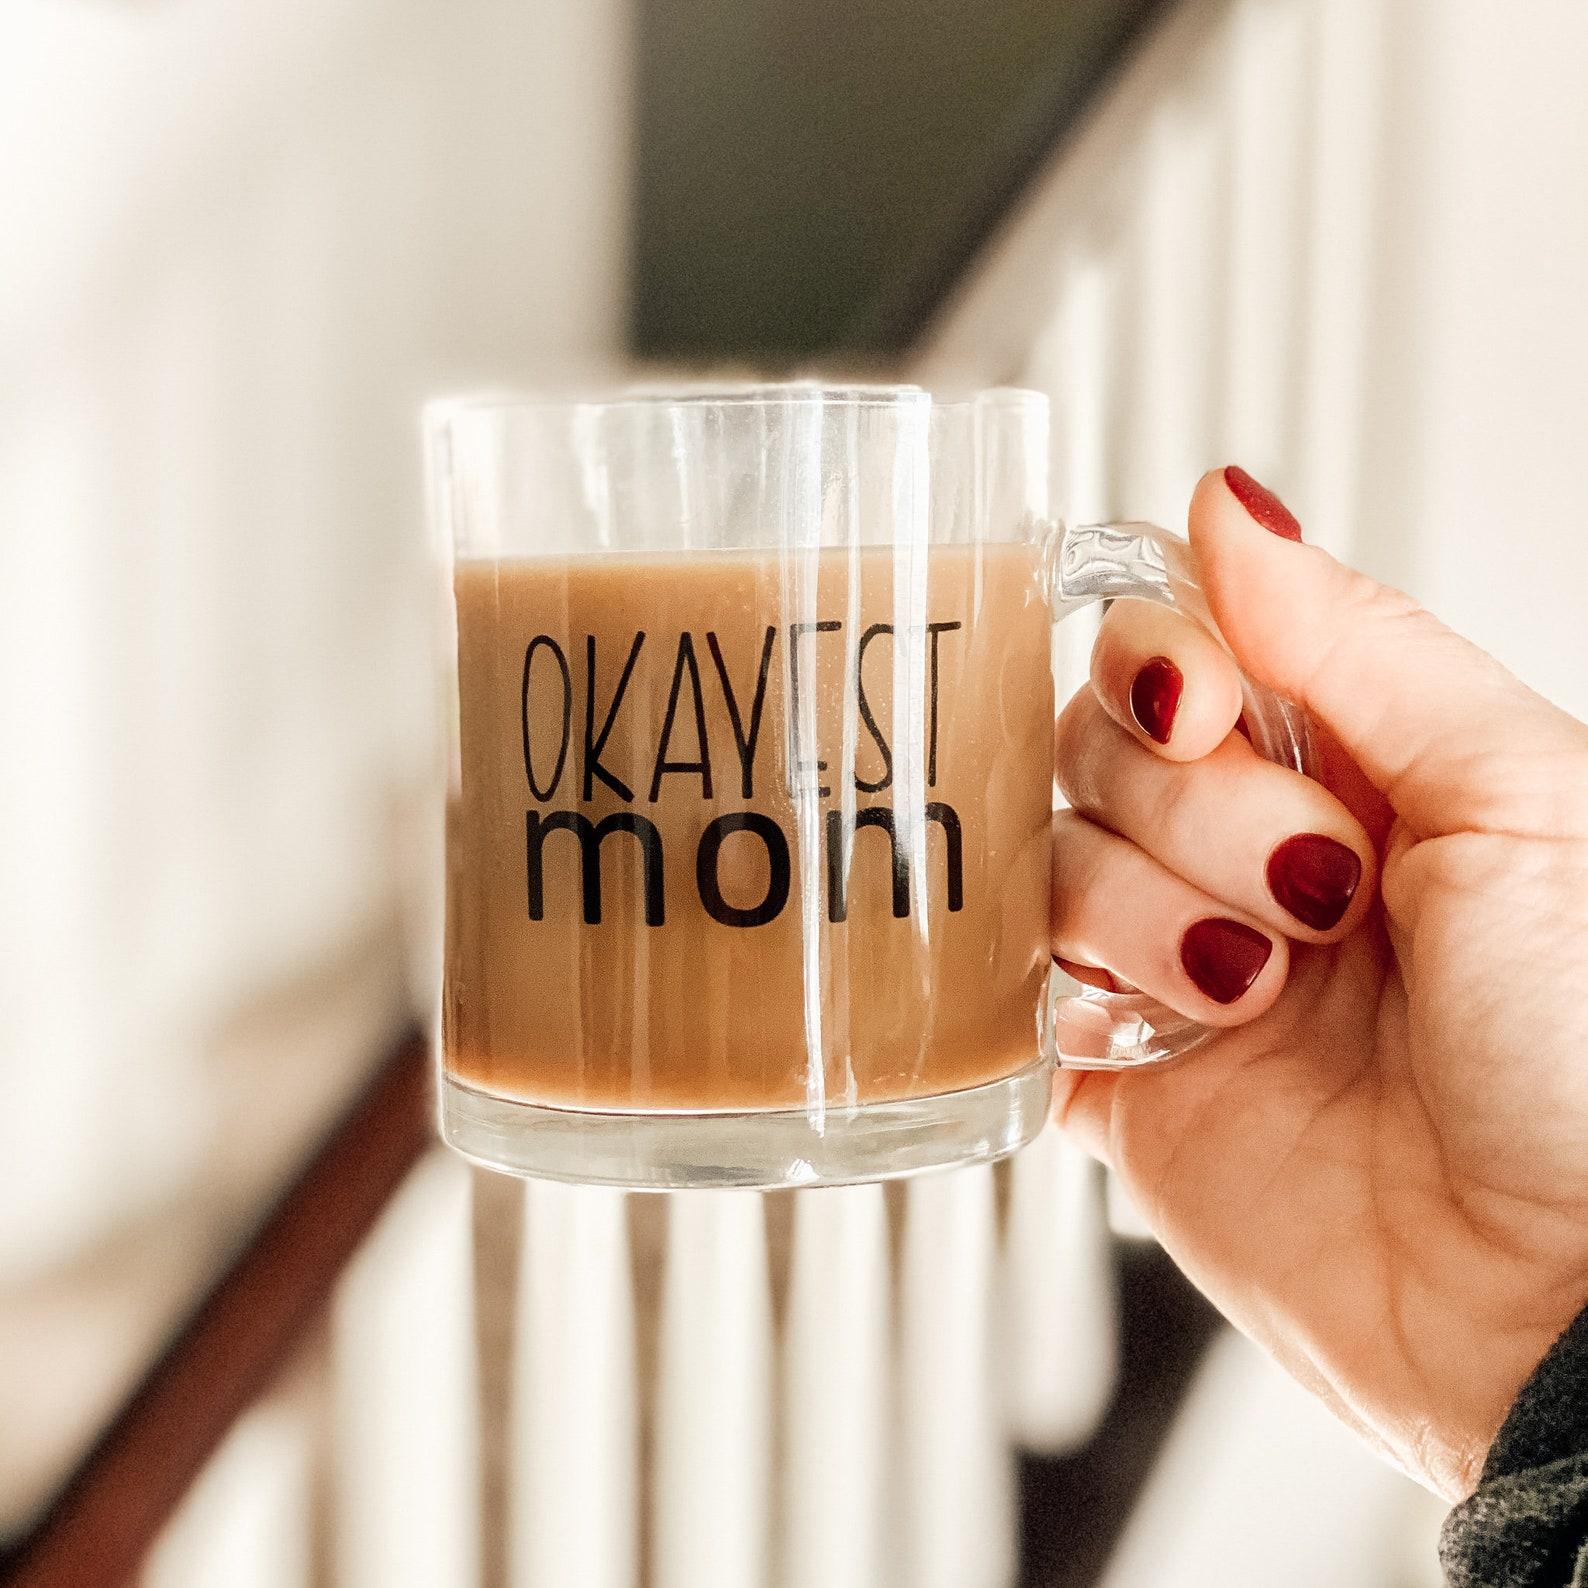 okayest mom glass mug with coffee and hand holding